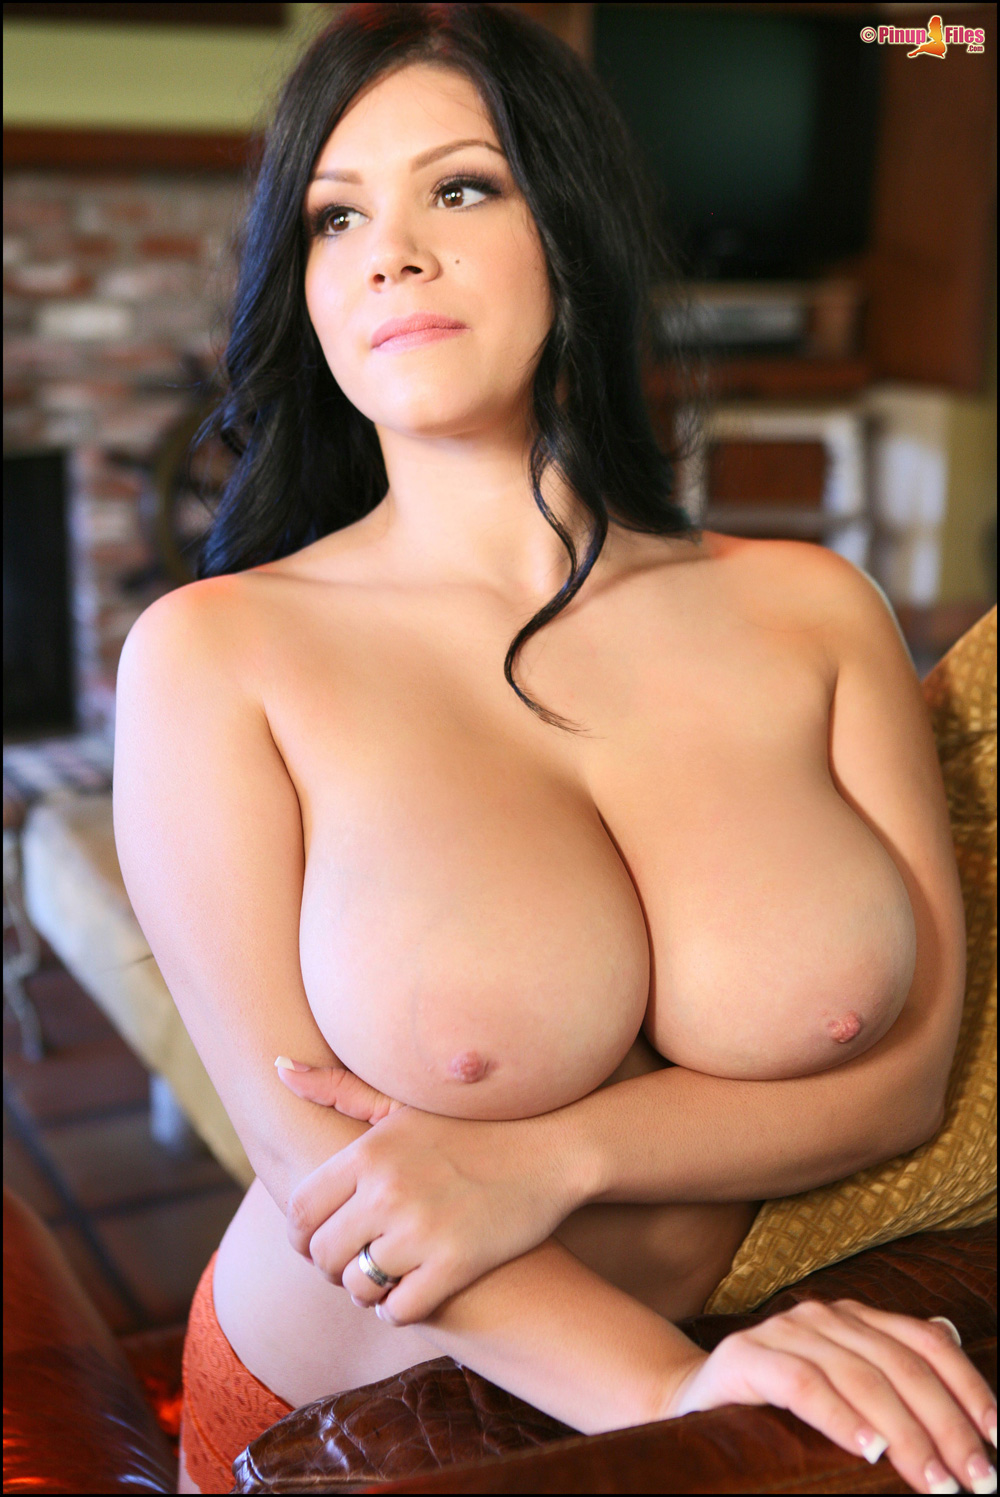 Candid boobs thick busty hispanic women black amp green 1 9